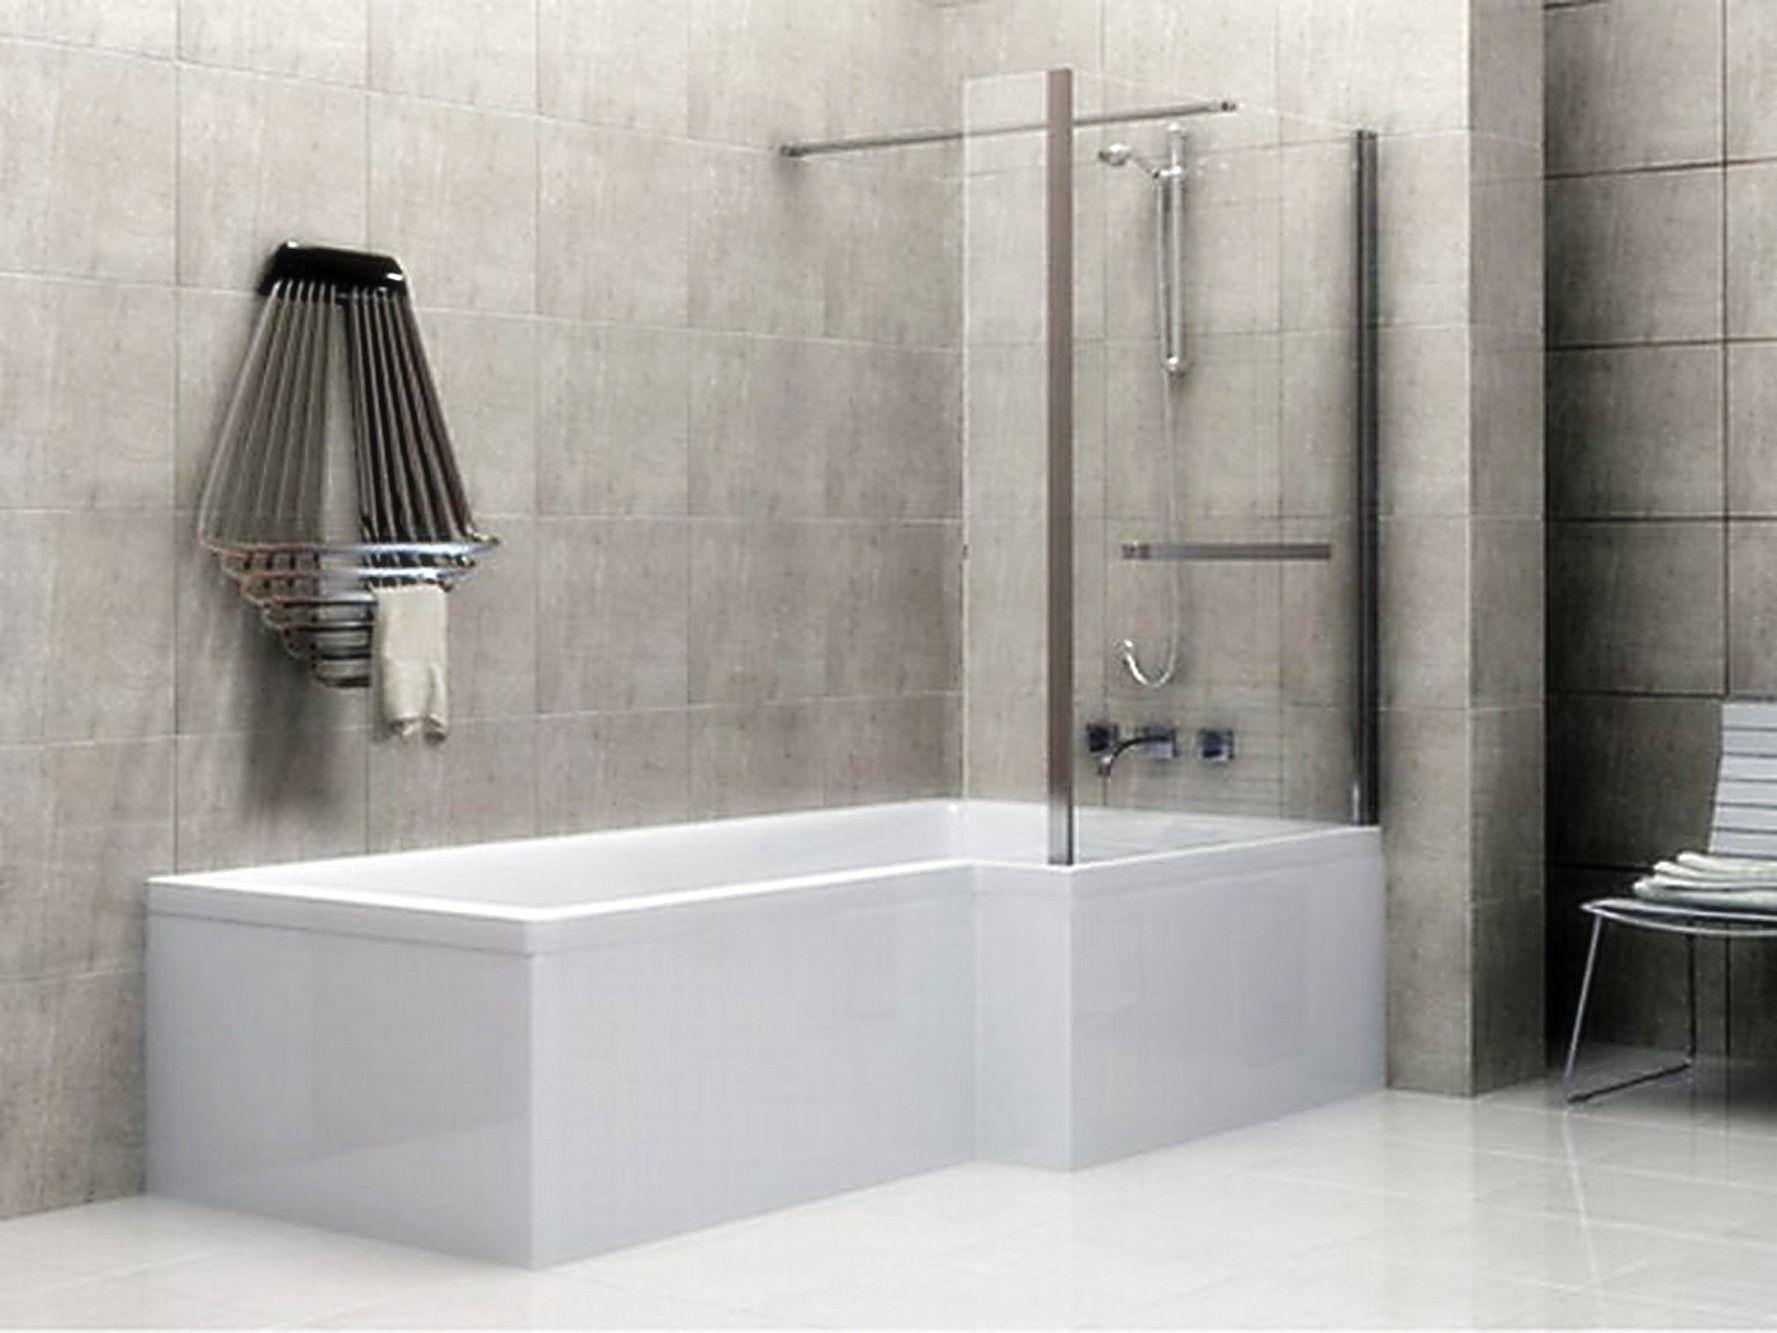 White quartz bathroom floor tiles httpnextsoft21 white quartz bathroom floor tiles dailygadgetfo Image collections